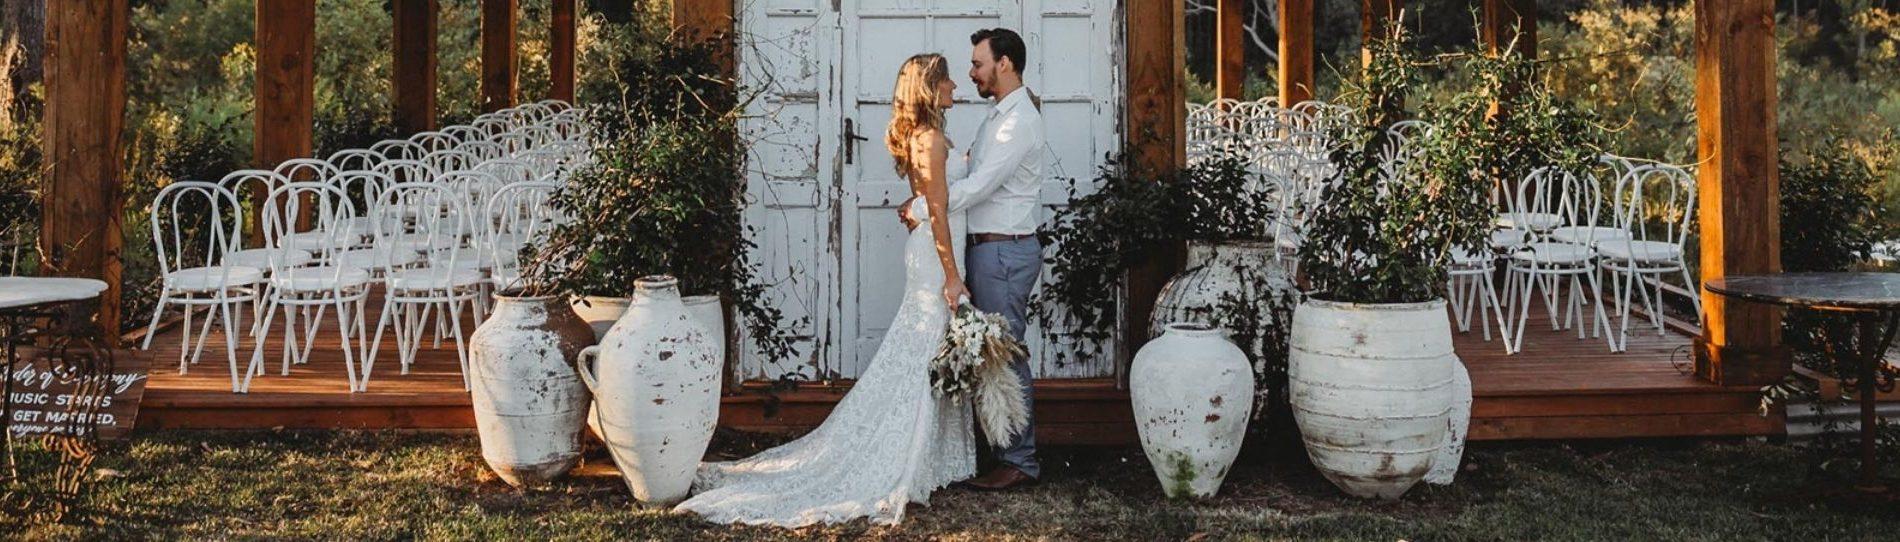 sydney top wedding venues and locations wicked bucks